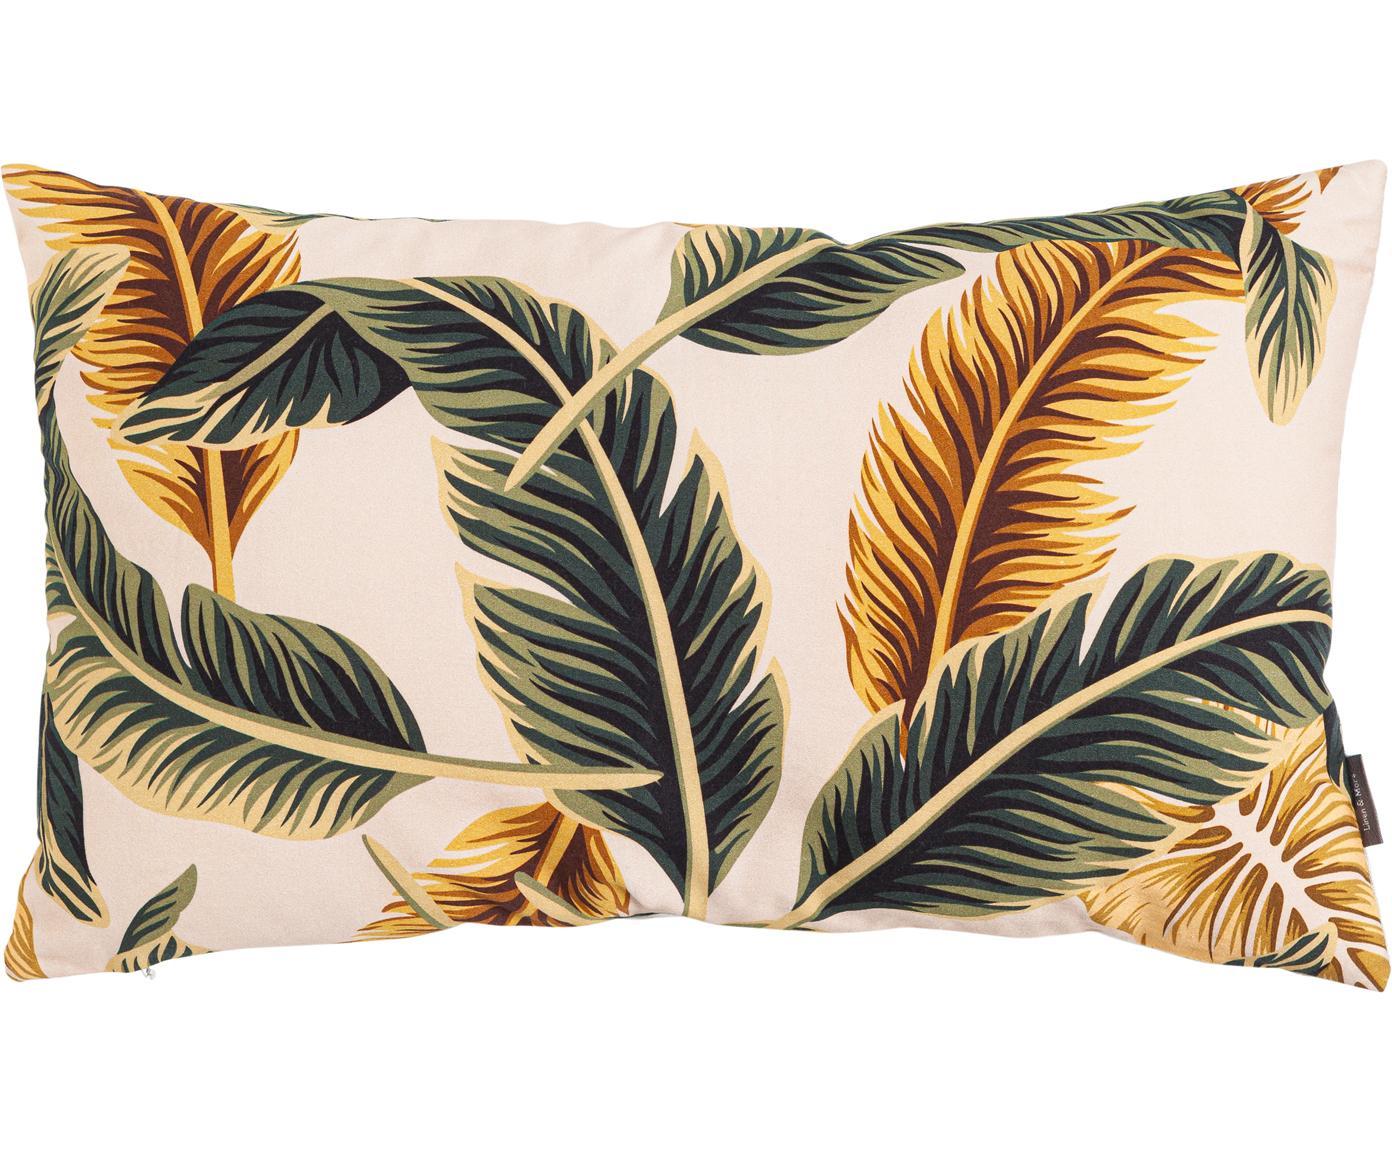 Cuscino con imbottitura Elegant Feather, Cotone, Beige, verde, giallo dorato, Larg. 30 x Lung. 50 cm